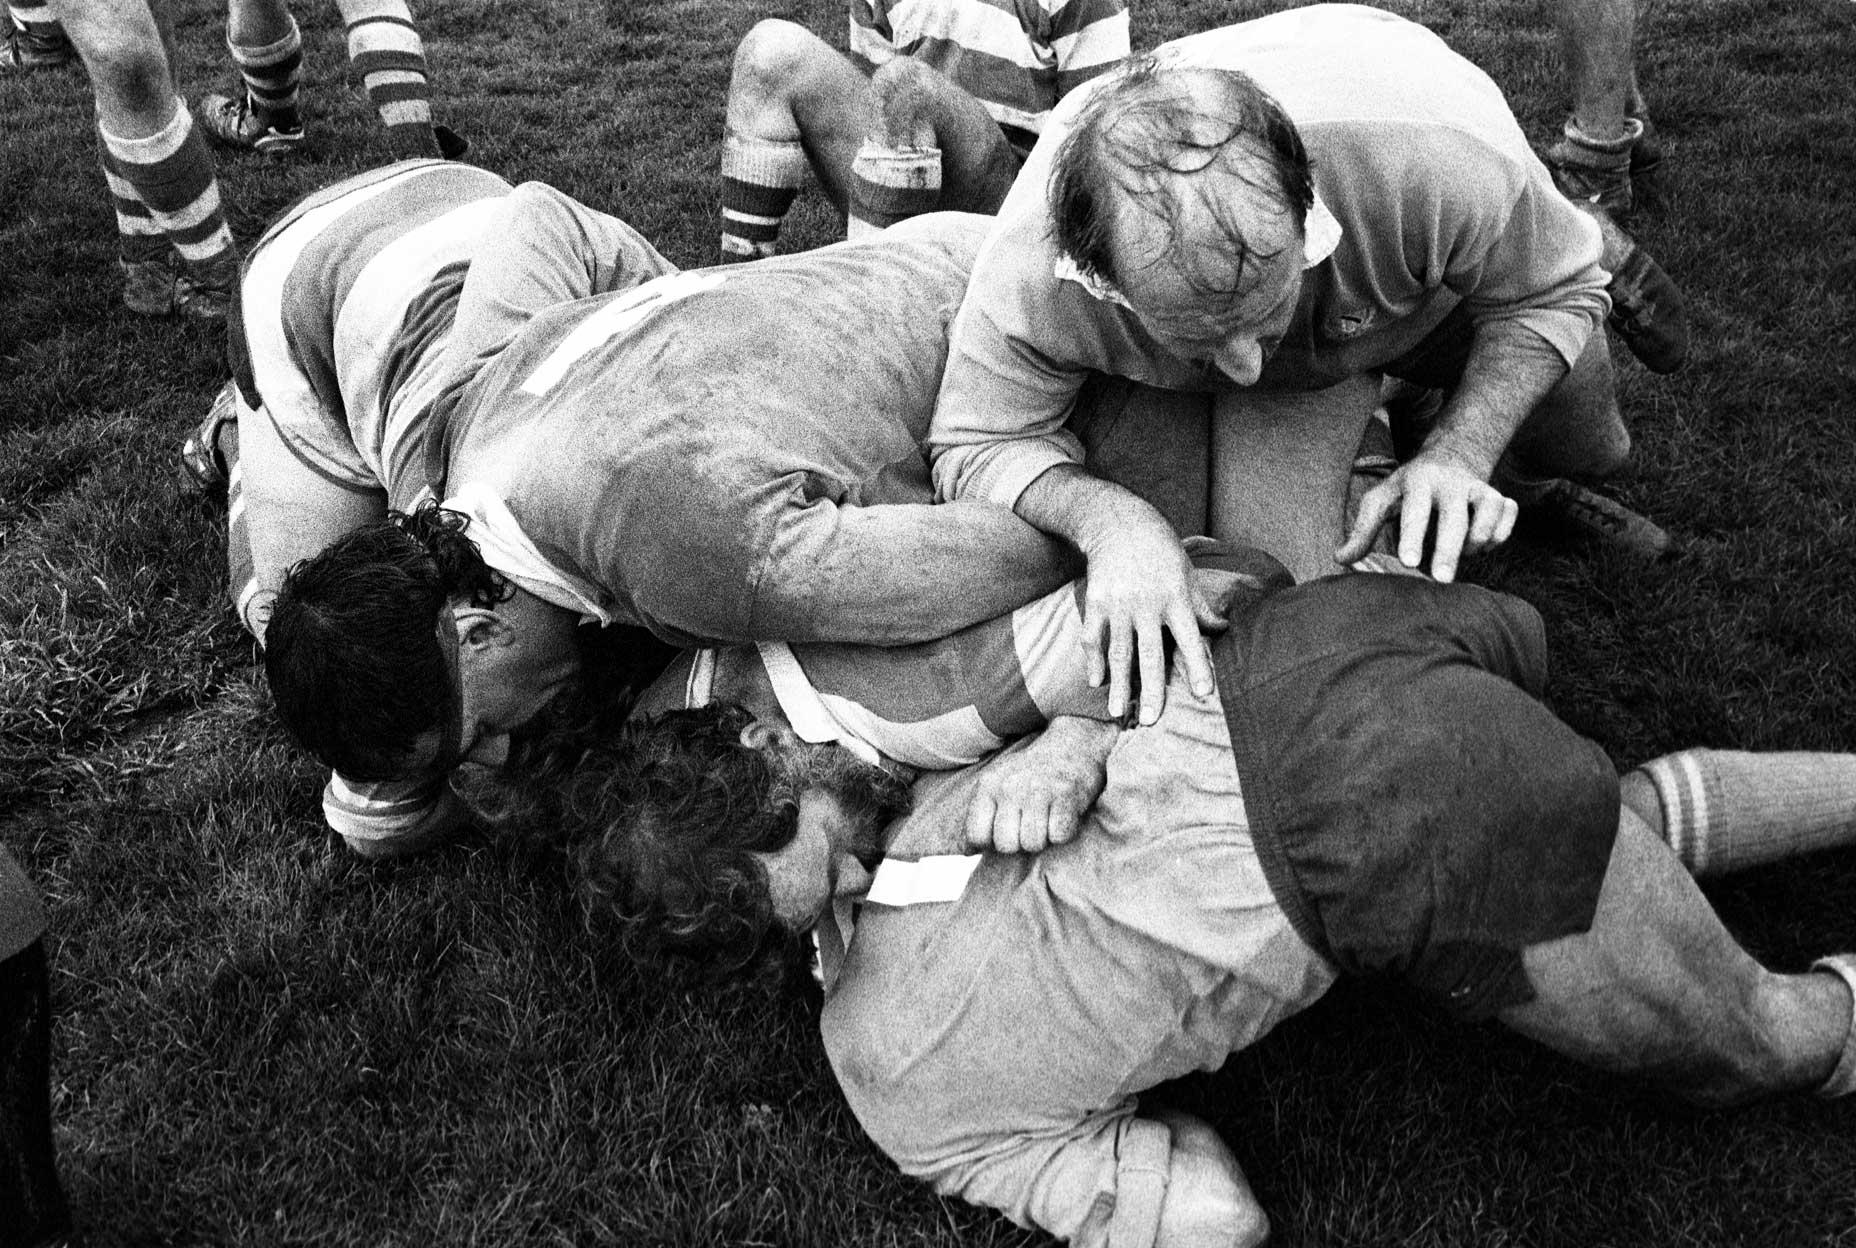 Seniors Rugby, Christchurch, 1993